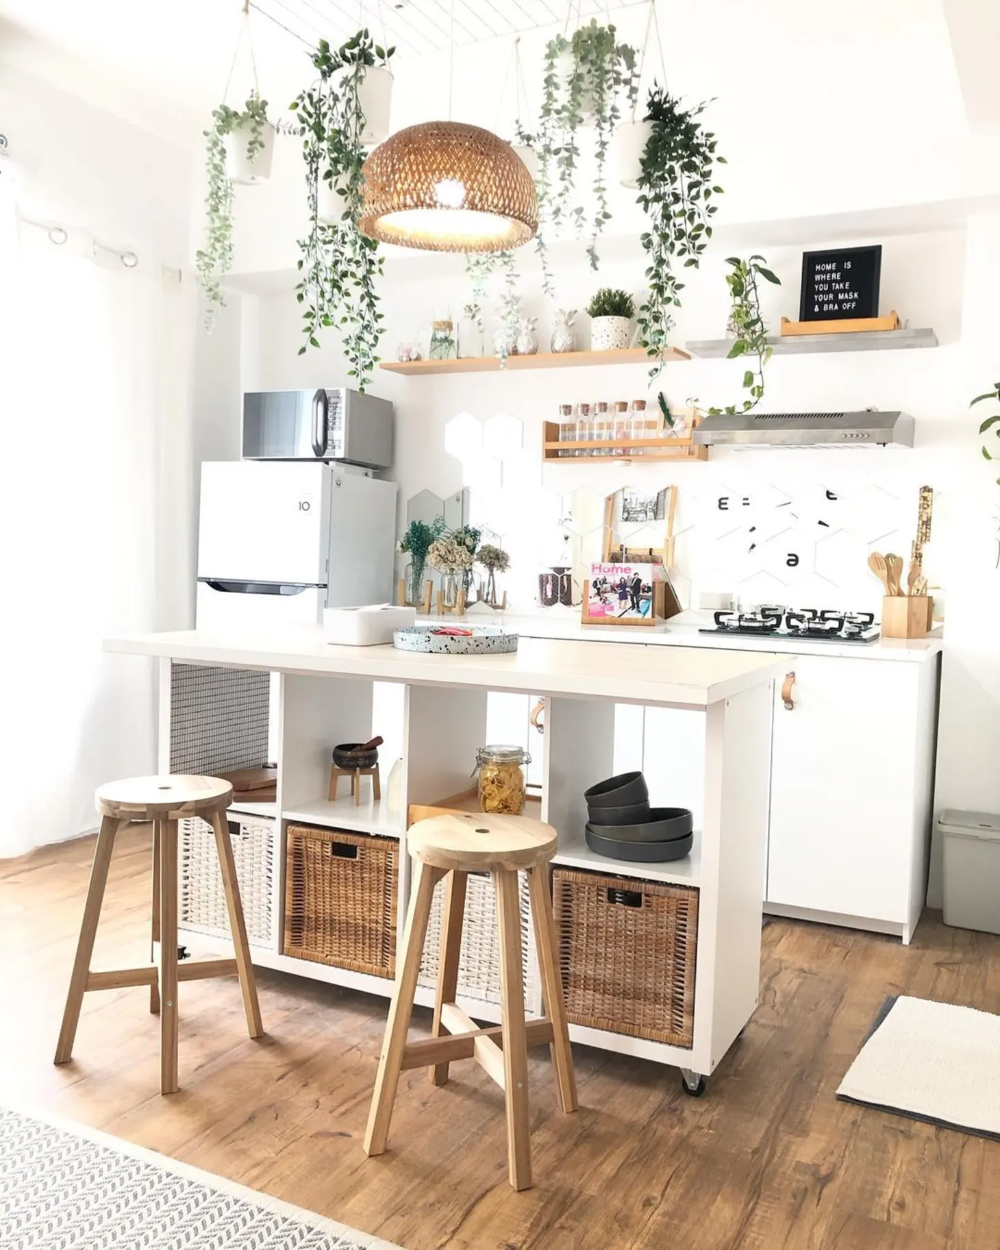 12 Tiny Kitchens with Seriously Big DIY Organization Ideas